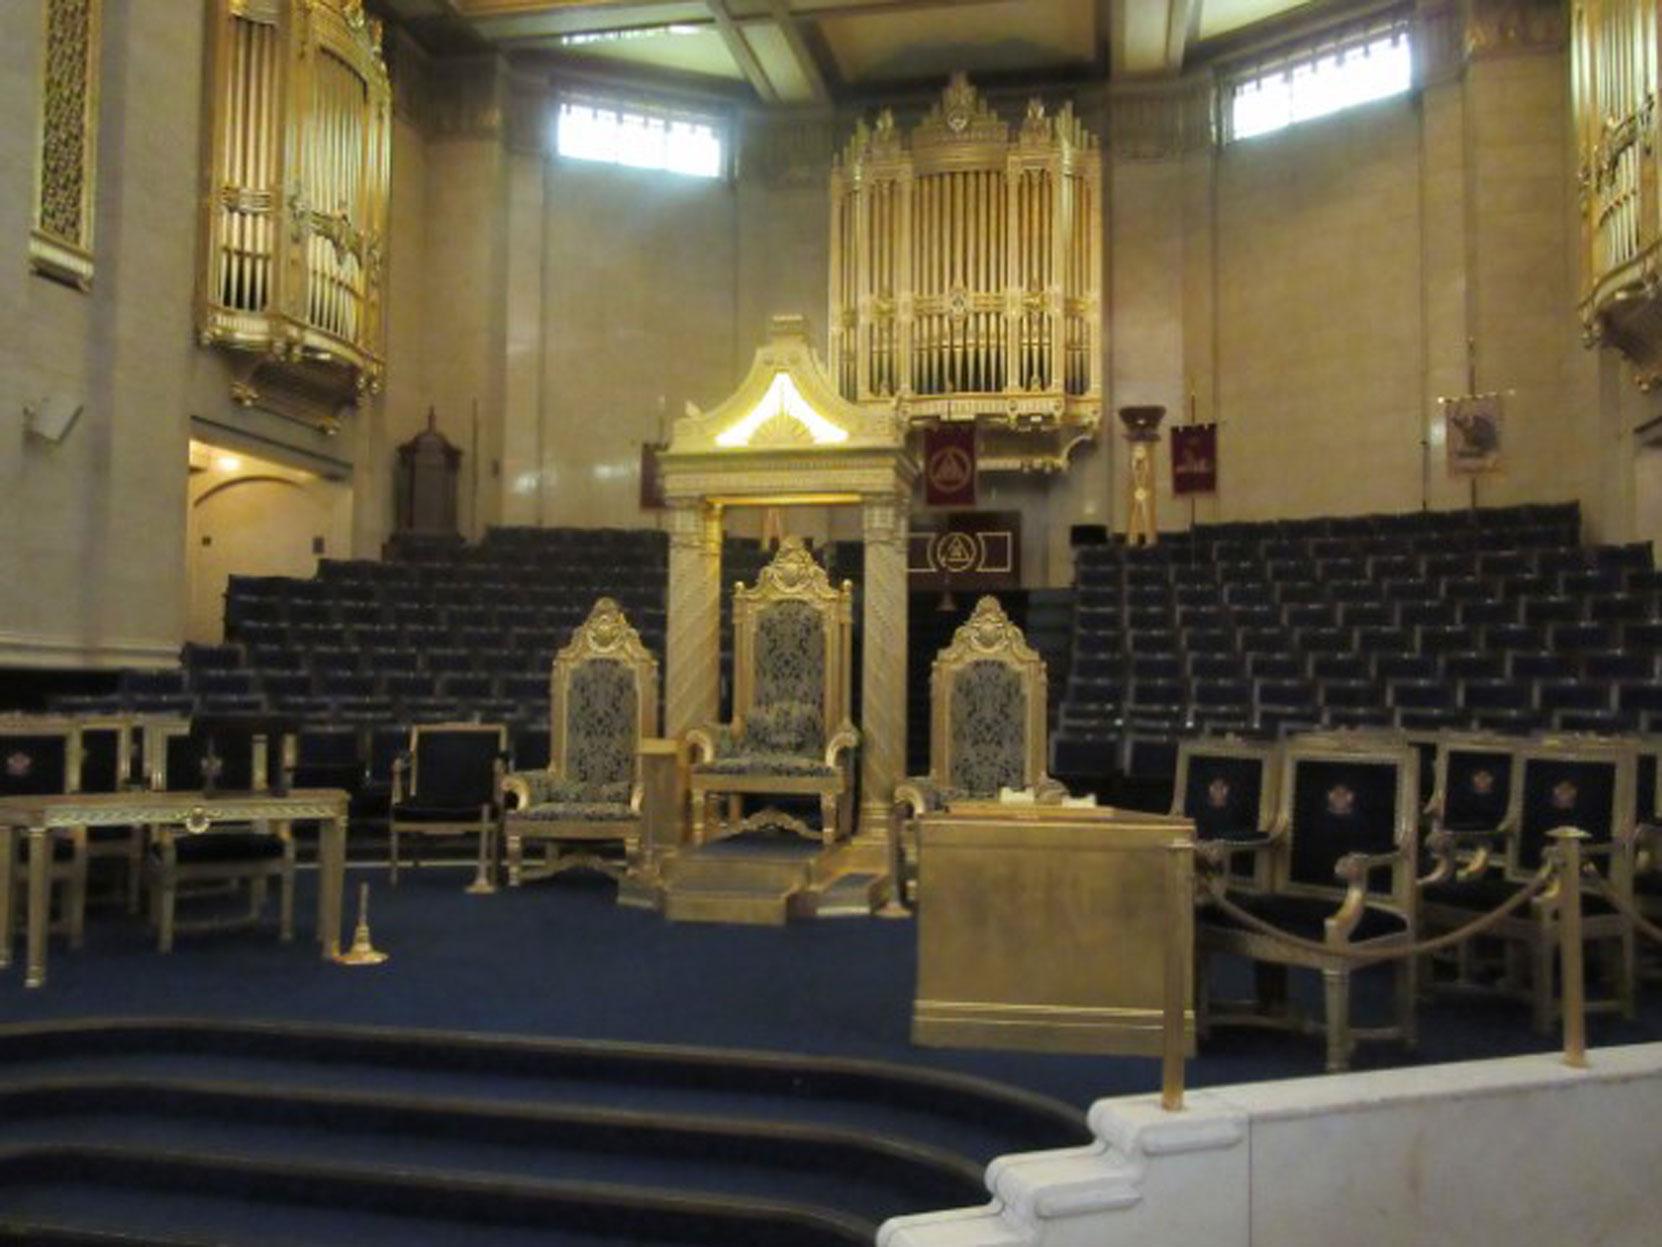 Grand Master's Chair. Grand Meeting Room, Freemasons Hall, London, UK, July 2018 (photo by Paul Philcox)